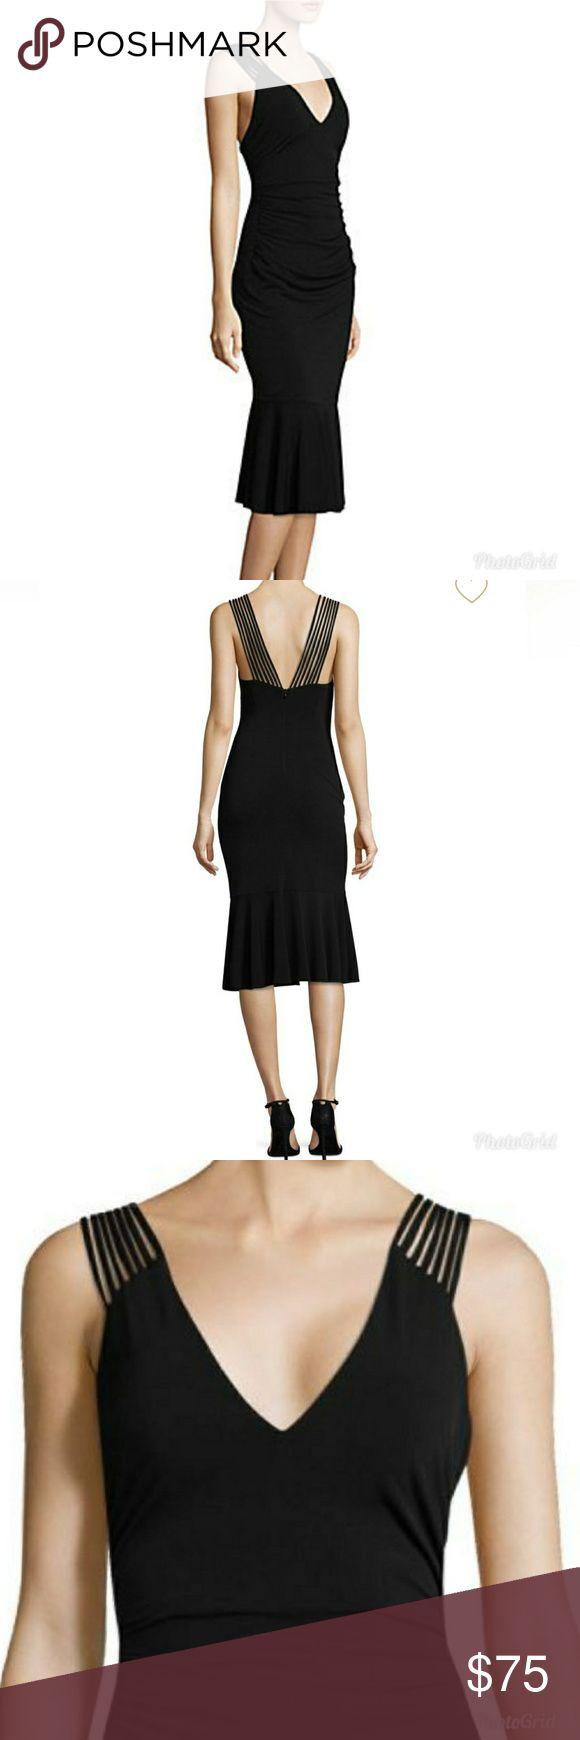 Laundry by Shelli Segal - Midi Dress  Brand new with tags! Black sleeveless jersey dress. Size 14. See above for dress details . Laundry By Shelli Segal Dresses Midi